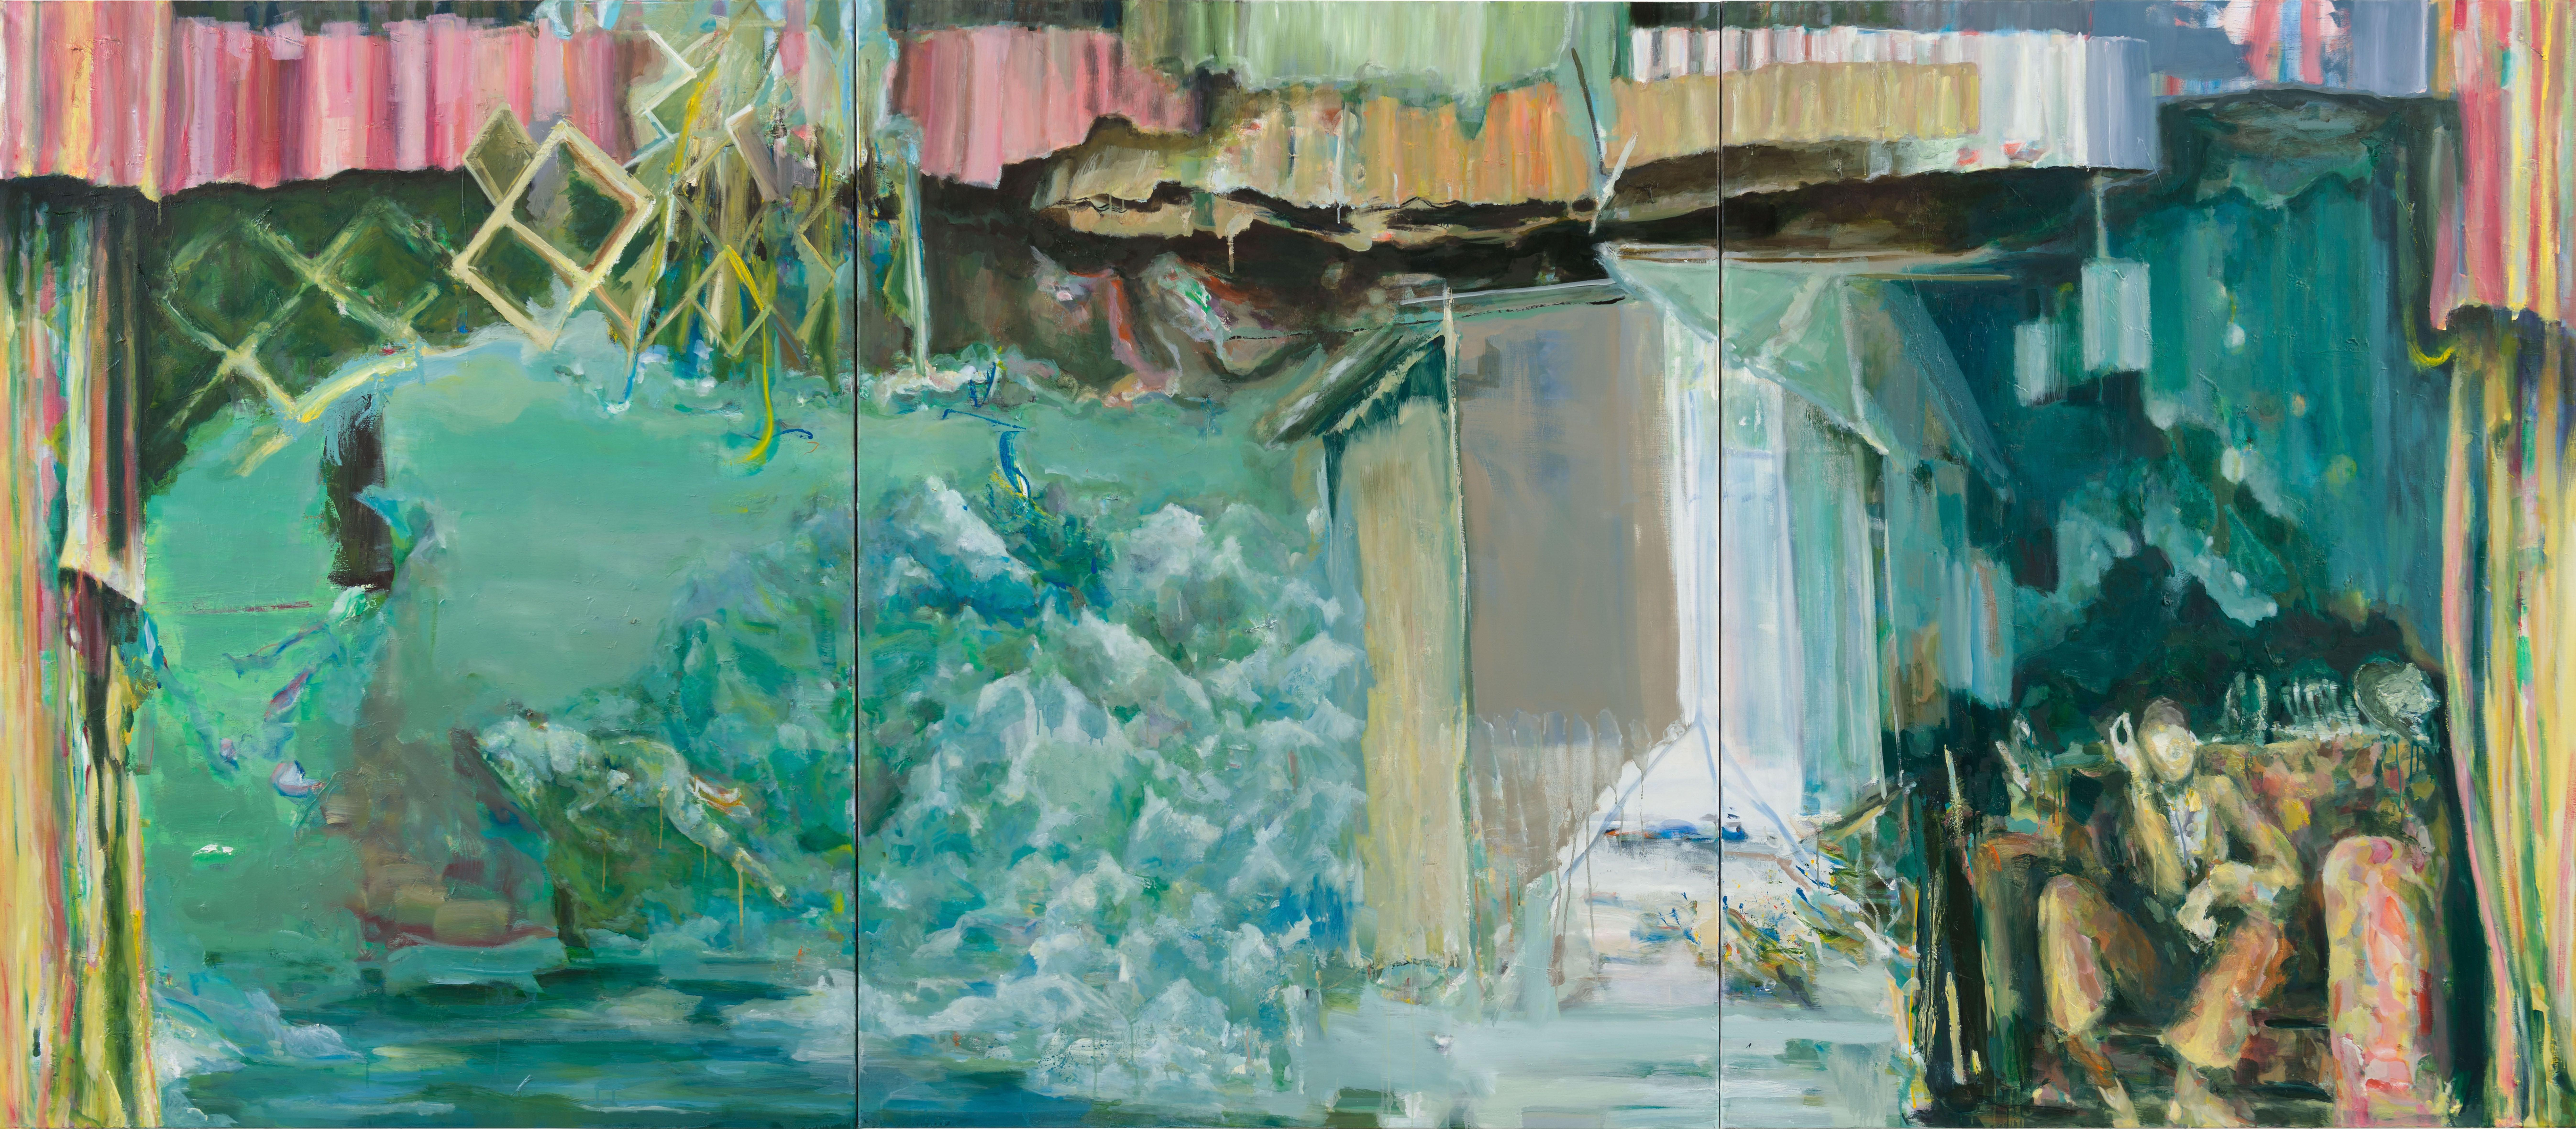 Valérie Favre, Balls and Tunnels, 2012, Öl auf Leinwand, 300x 195 cm, © VG Bild-Kunst, Bonn, 2016